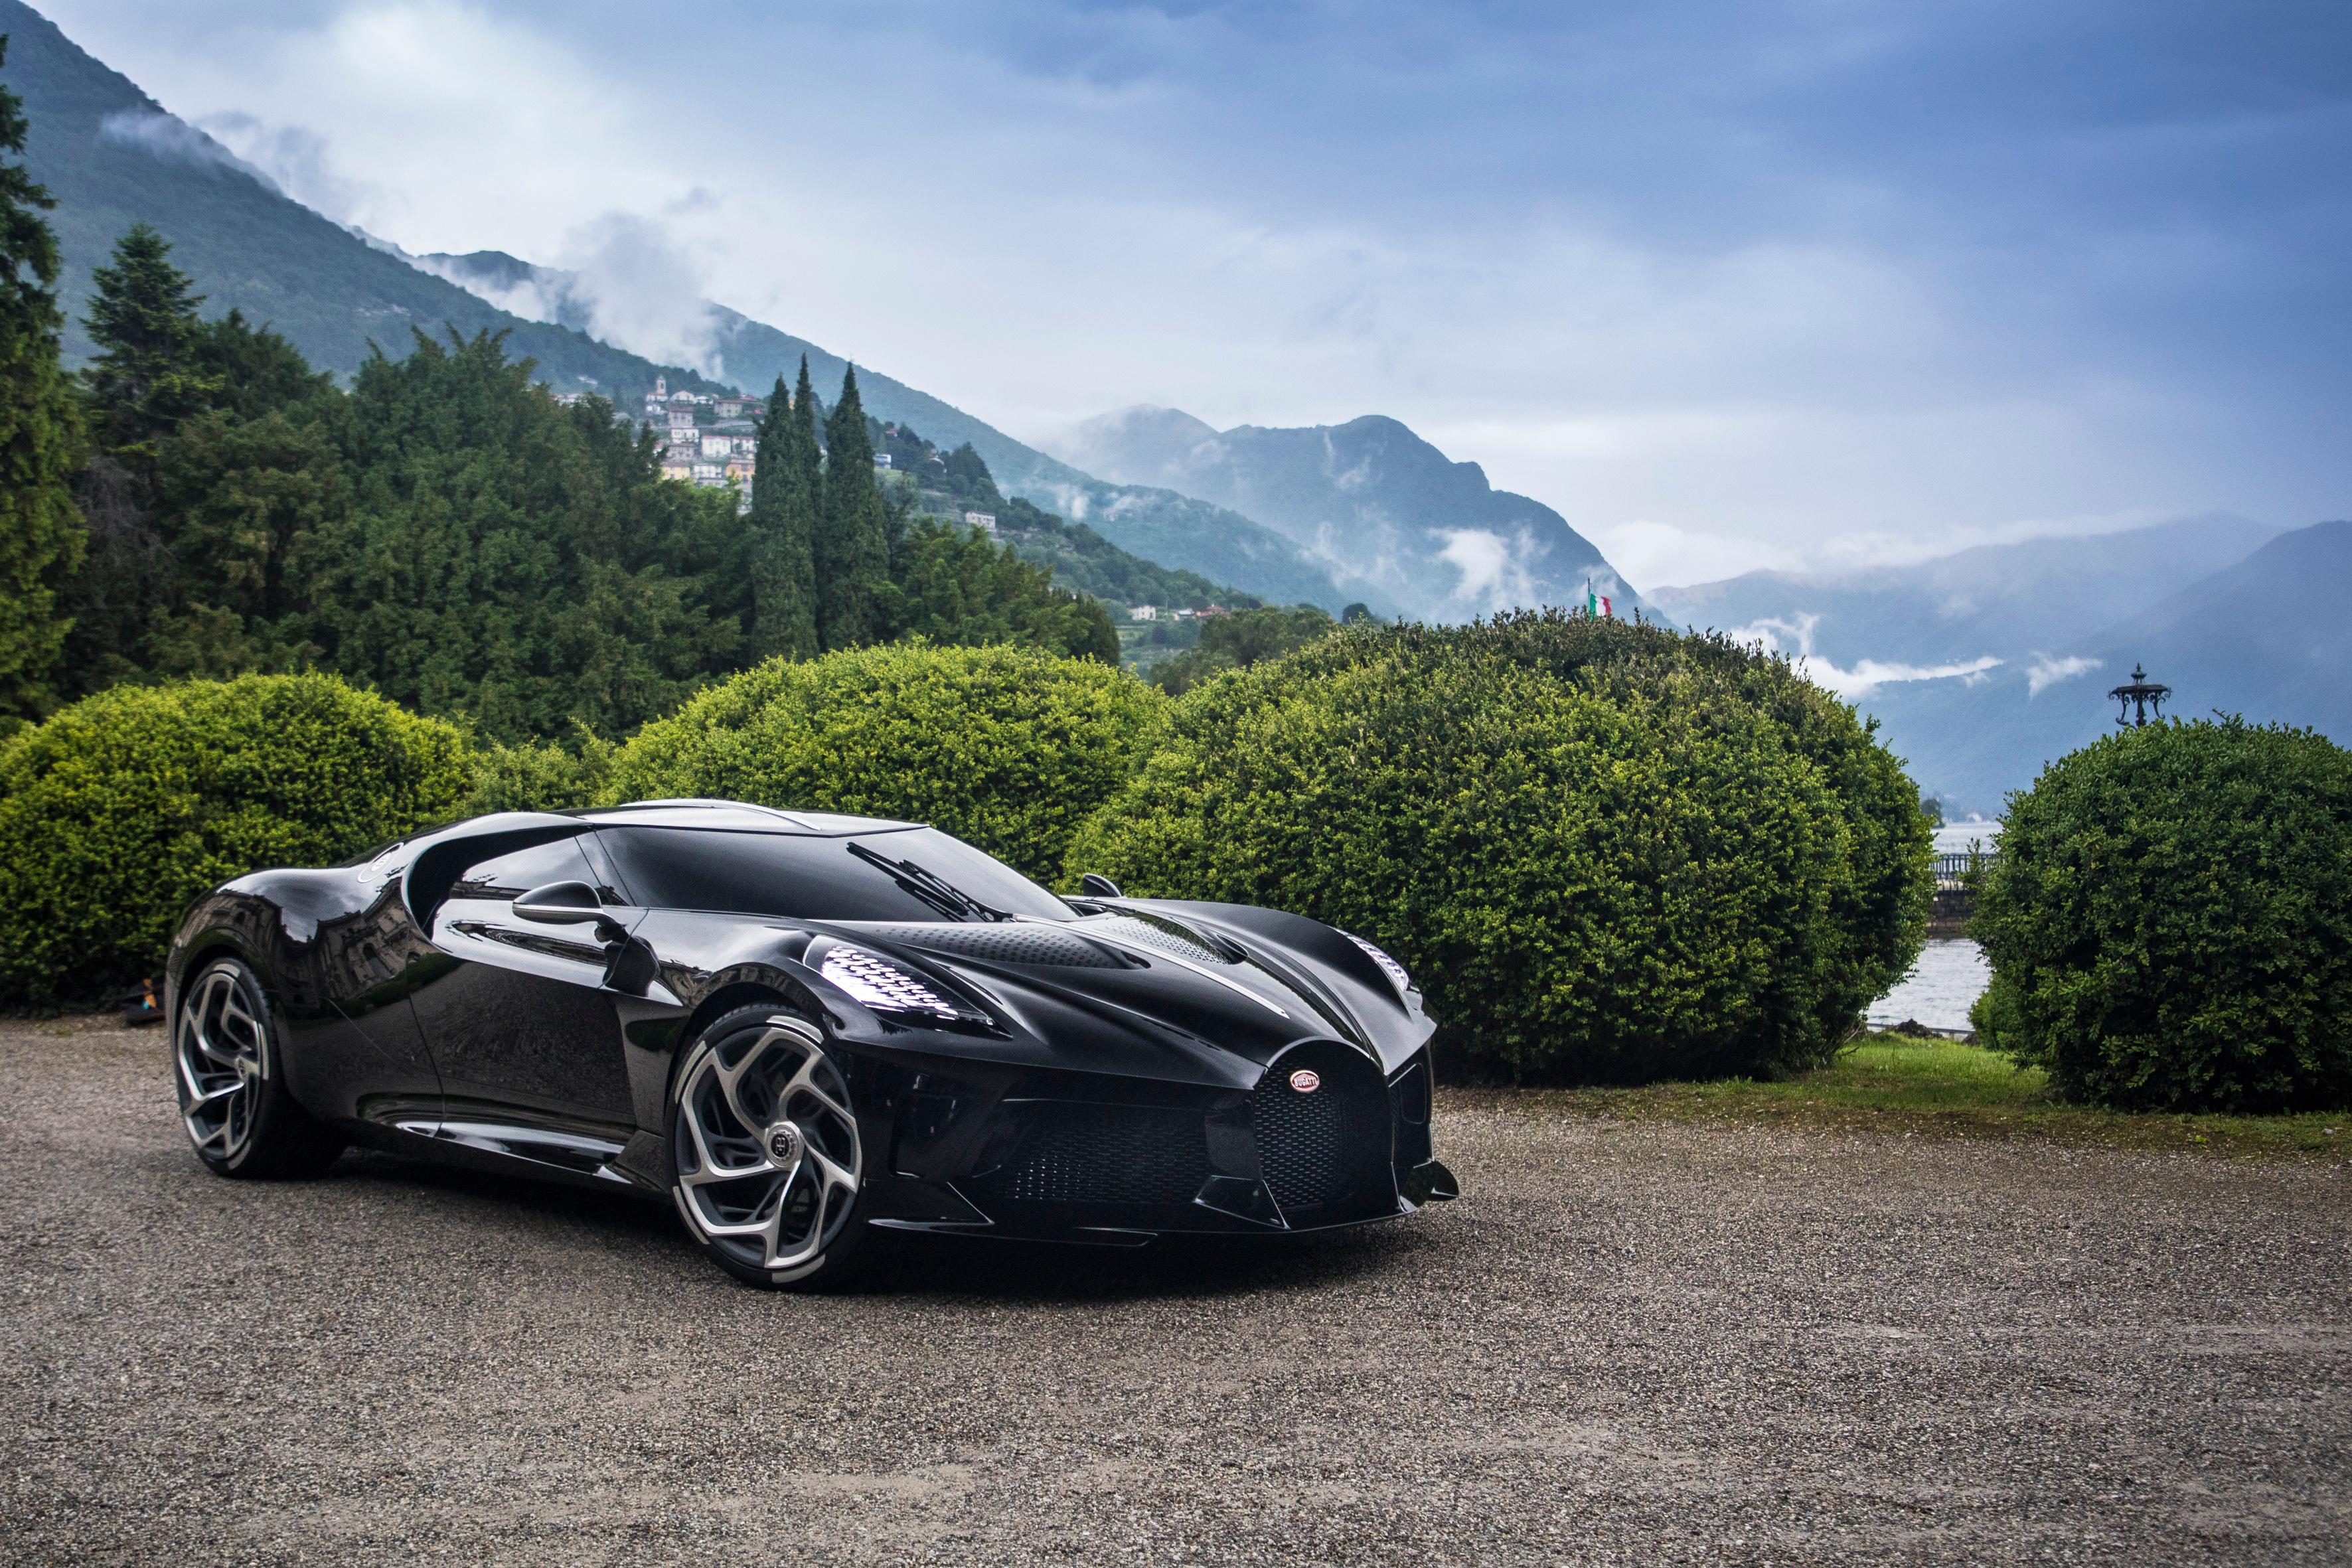 Download 2019 Bugatti La Voiture Noire Luxury Car: 2019 Bugatti La Voiture Noire 4k, HD Cars, 4k Wallpapers